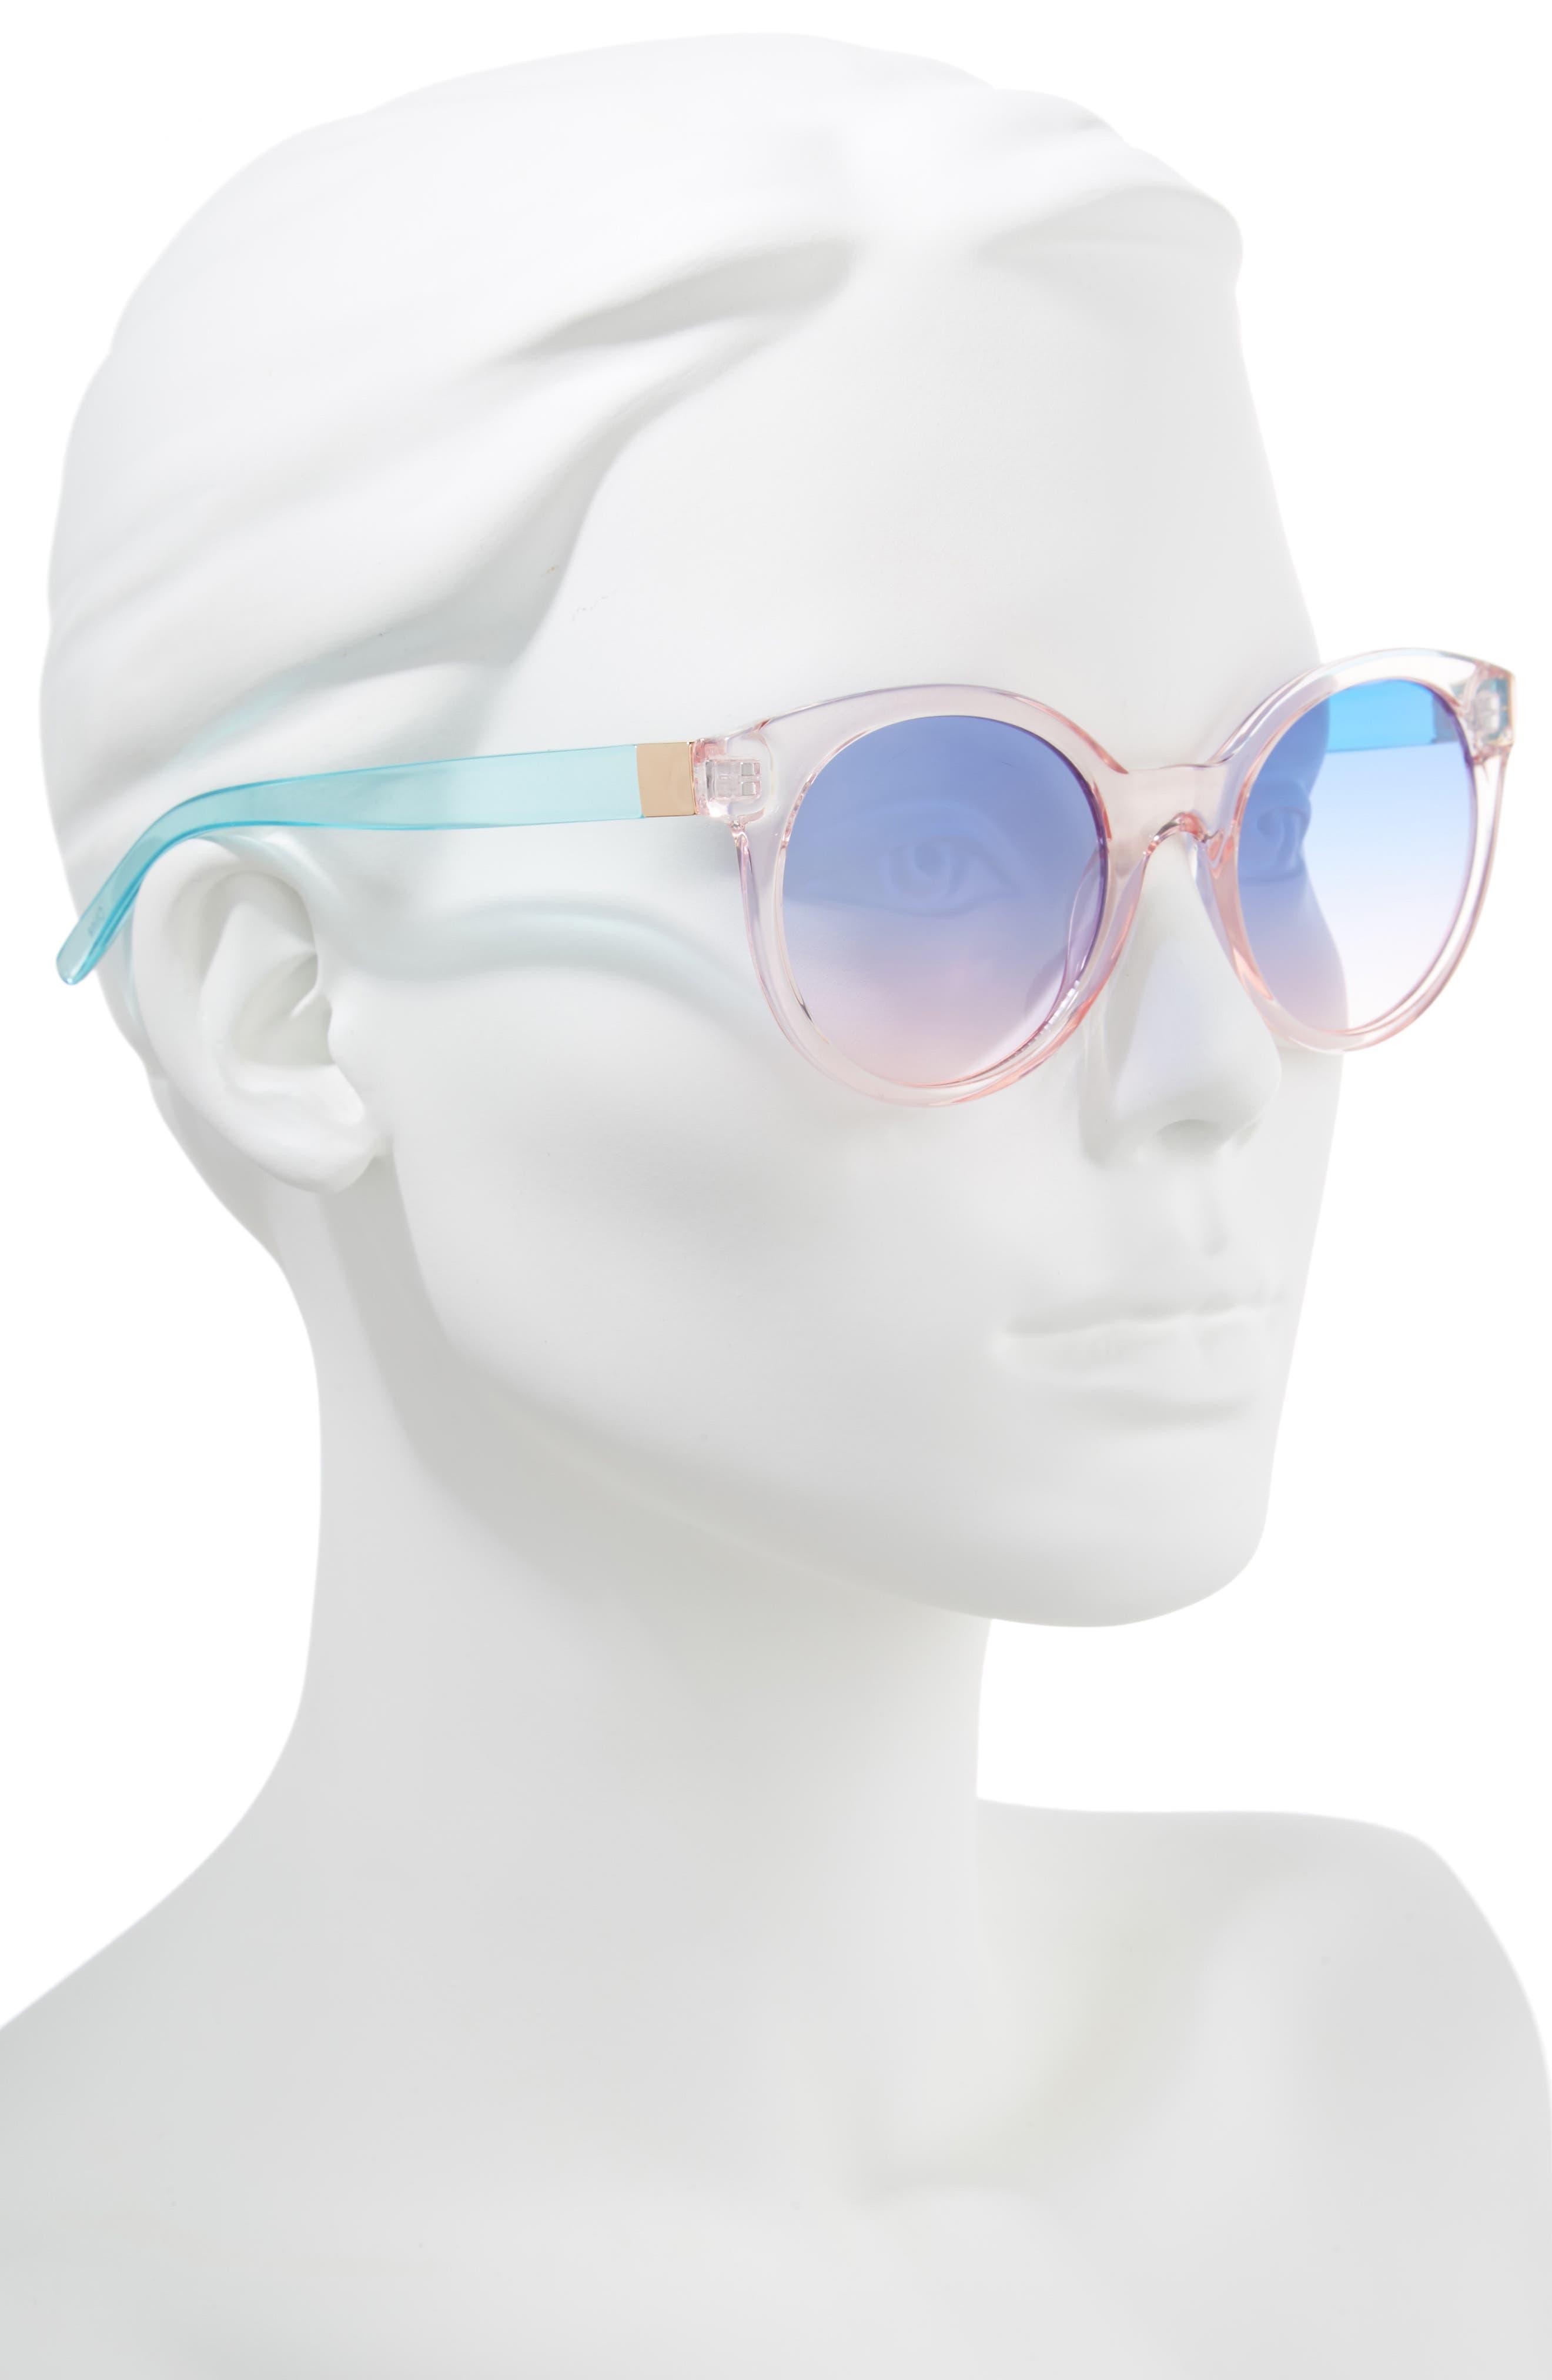 Transparent Round Sunglasses,                             Alternate thumbnail 2, color,                             Multi